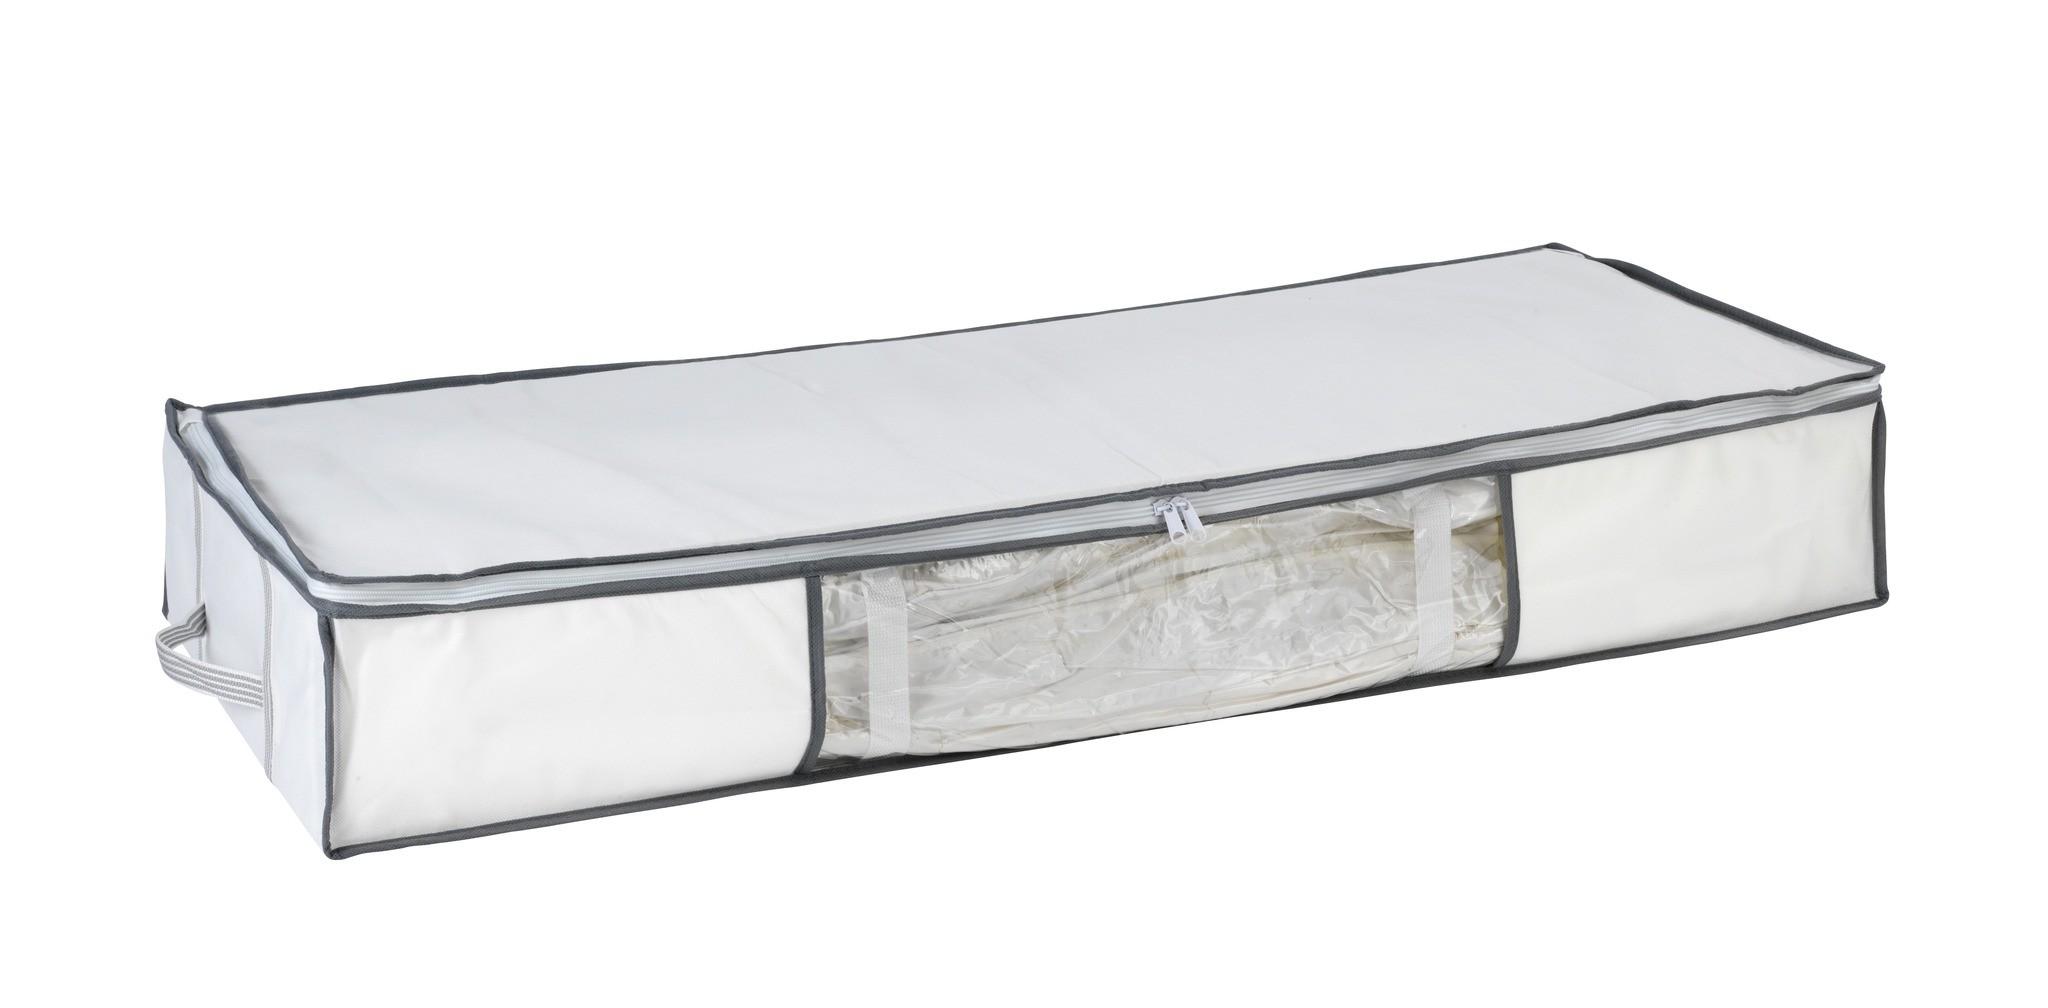 Wenko Vakuum Soft Unterbett-Box